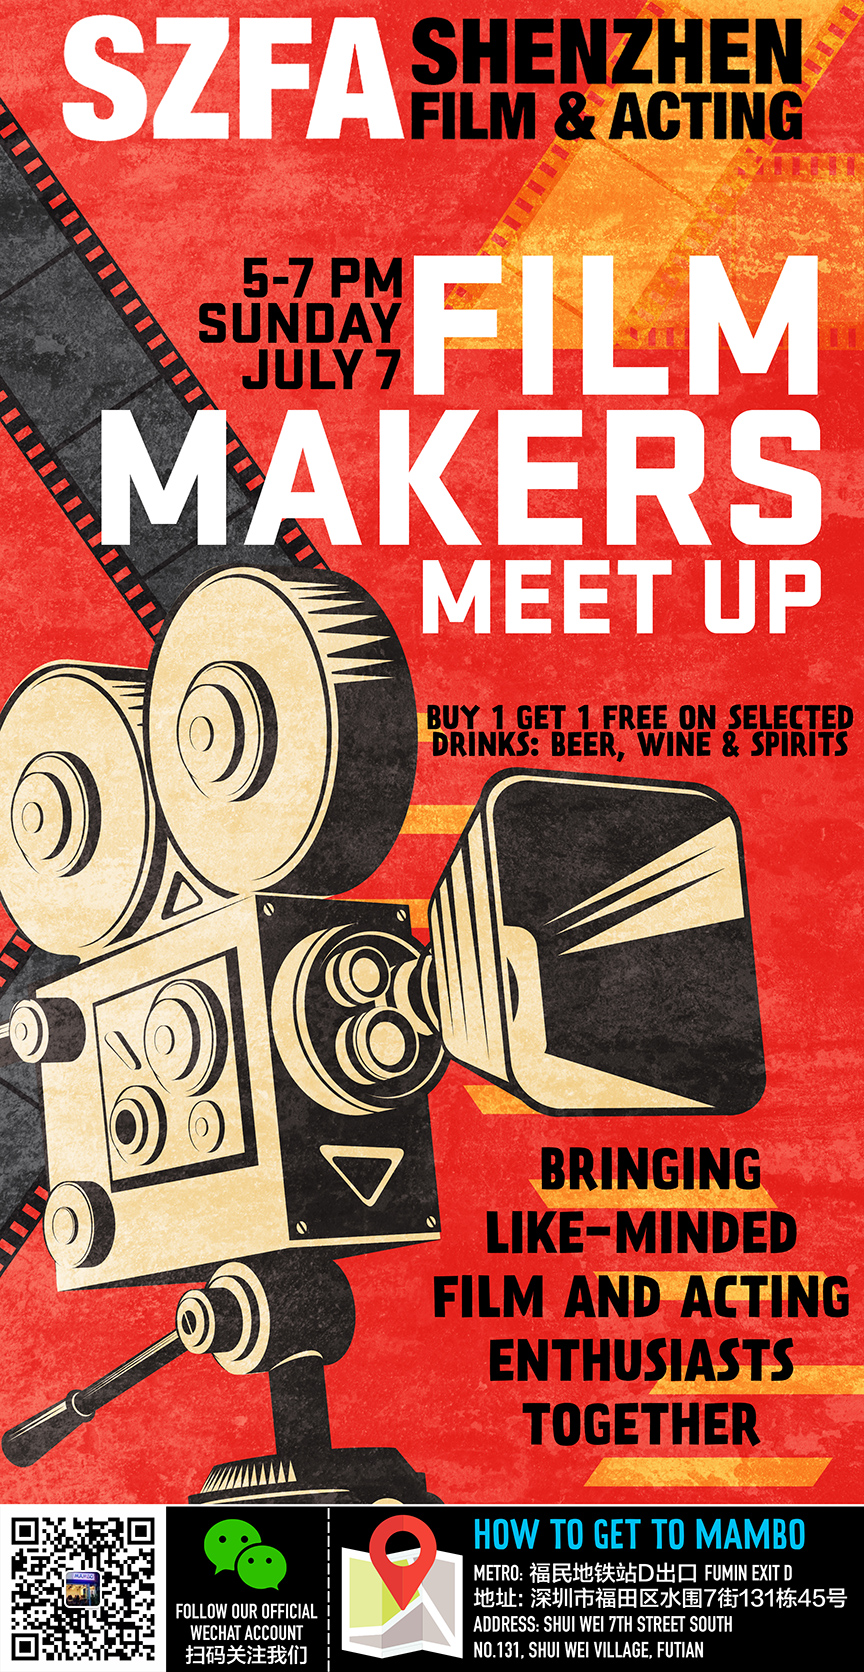 Meetings   SHENZHEN FILM & ACTING